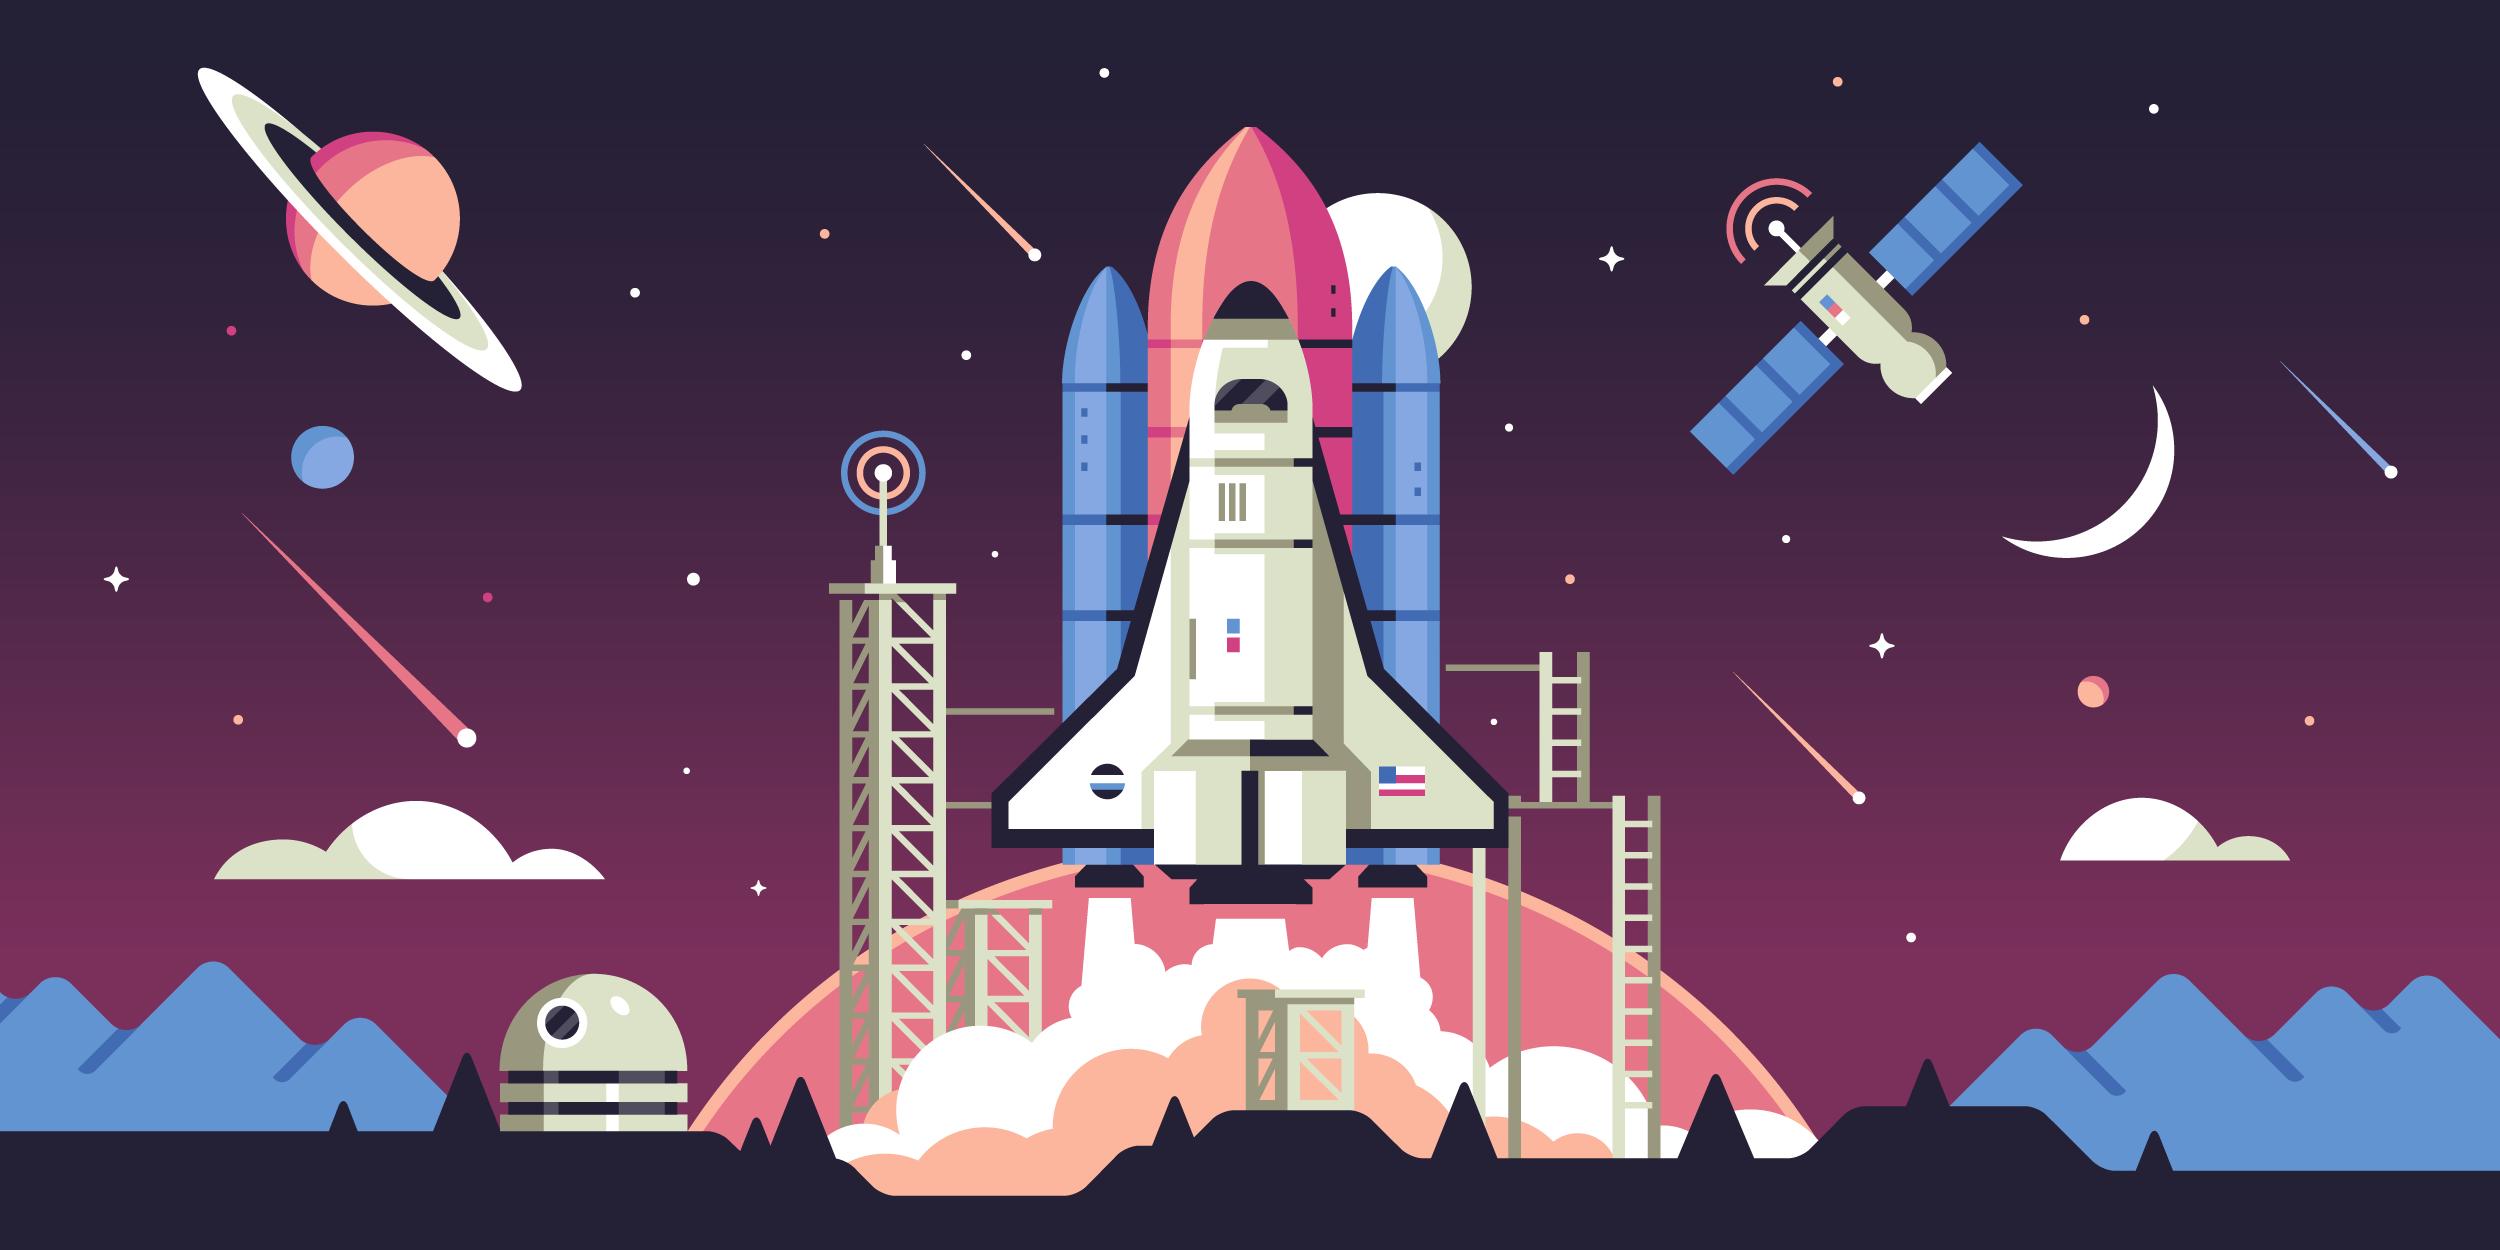 Rocket Launch / Space Illustration by Matt Anderson